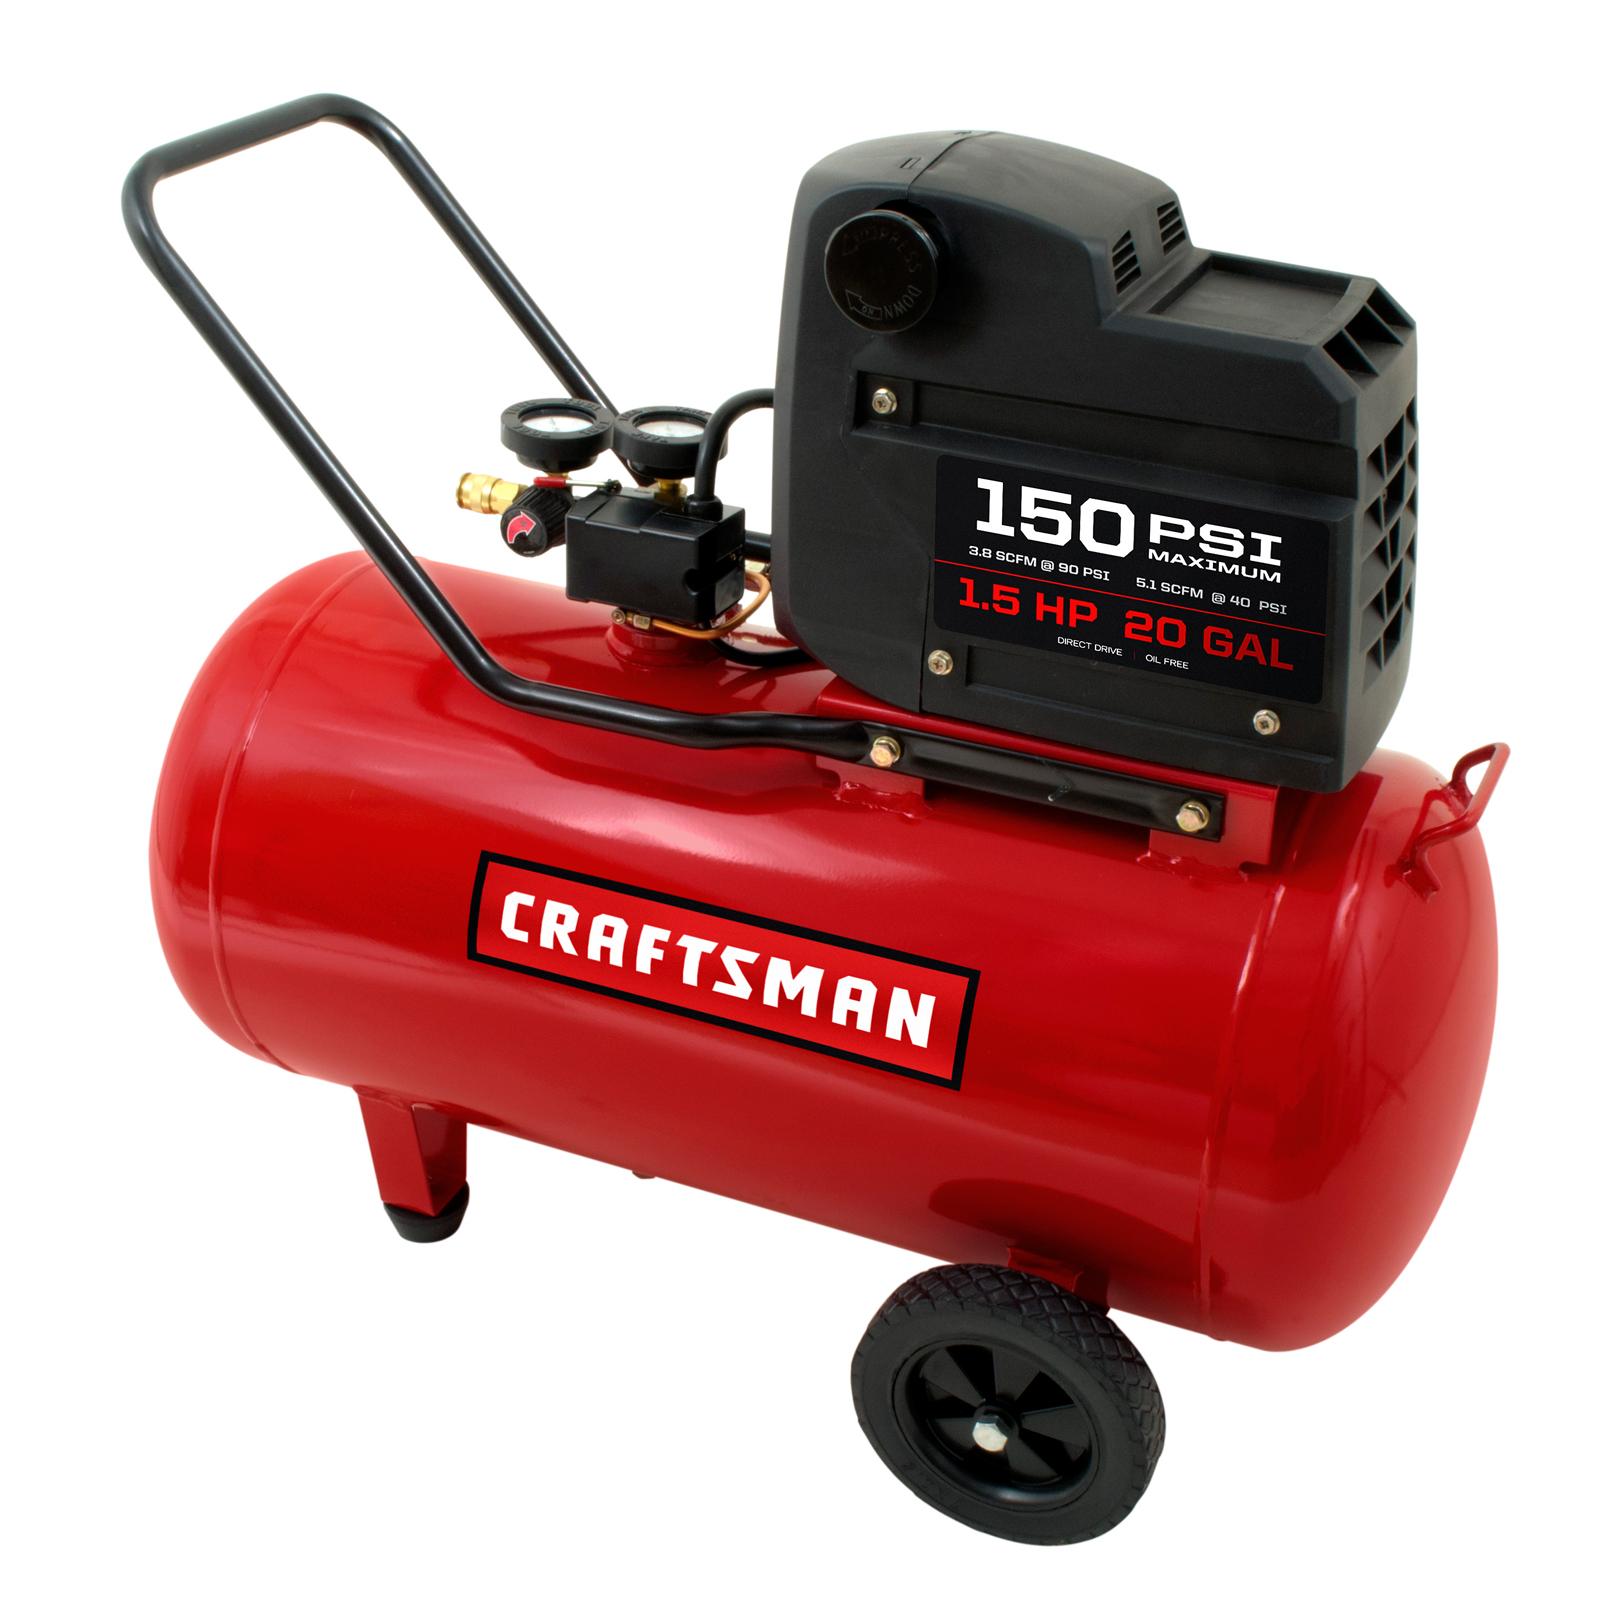 Craftsman 20 Gallon 1.5 Hp Oil-free Portable Horizontal